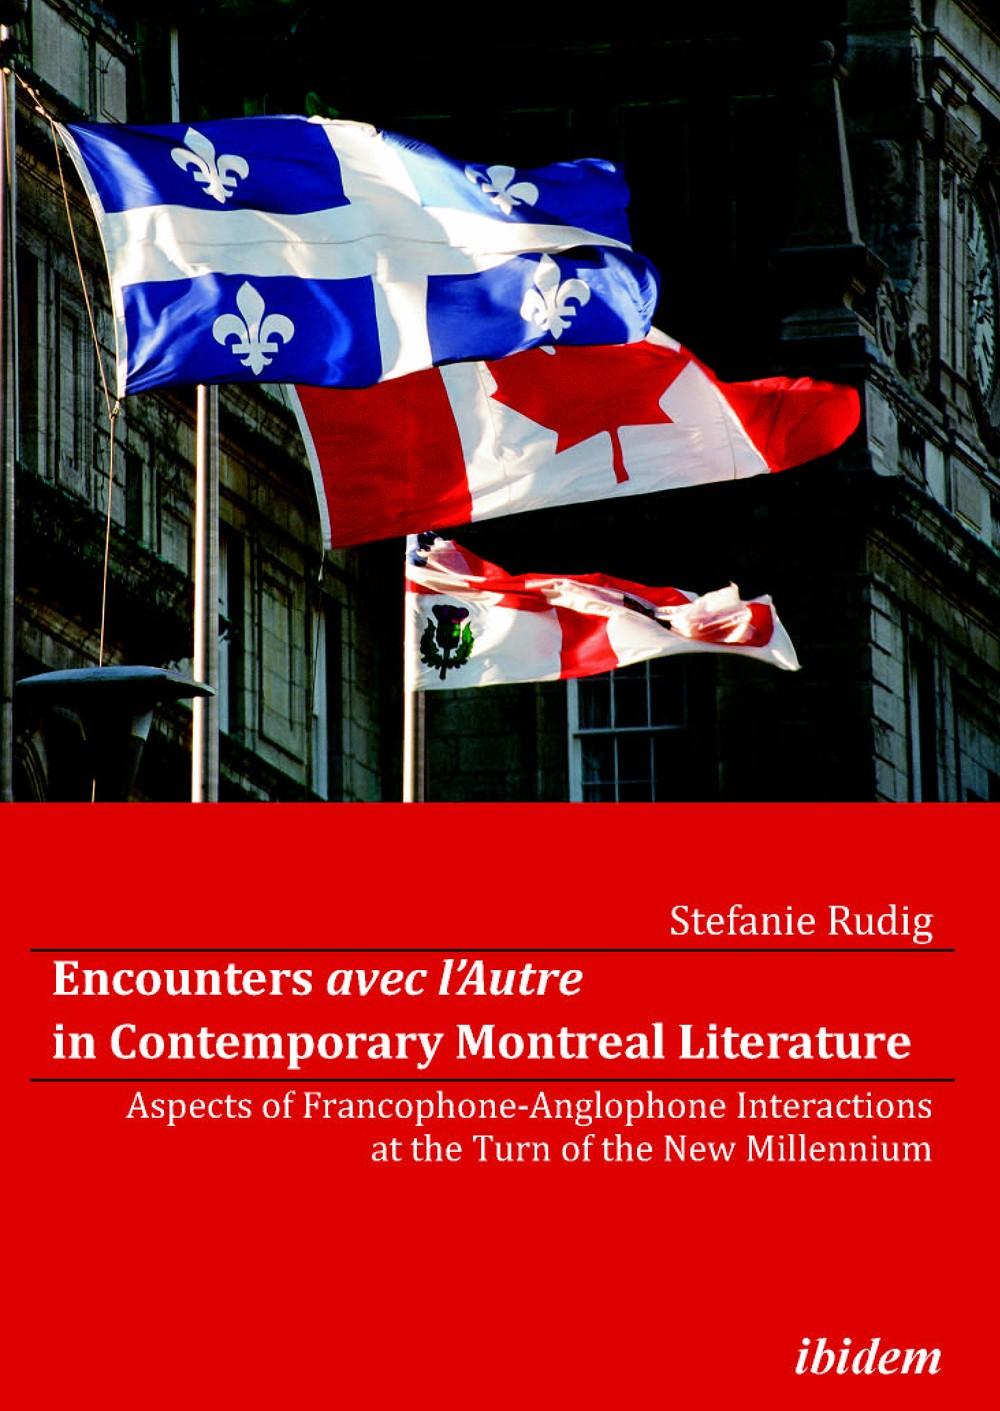 Encounters avec l'Autre in Contemporary Montreal Literature